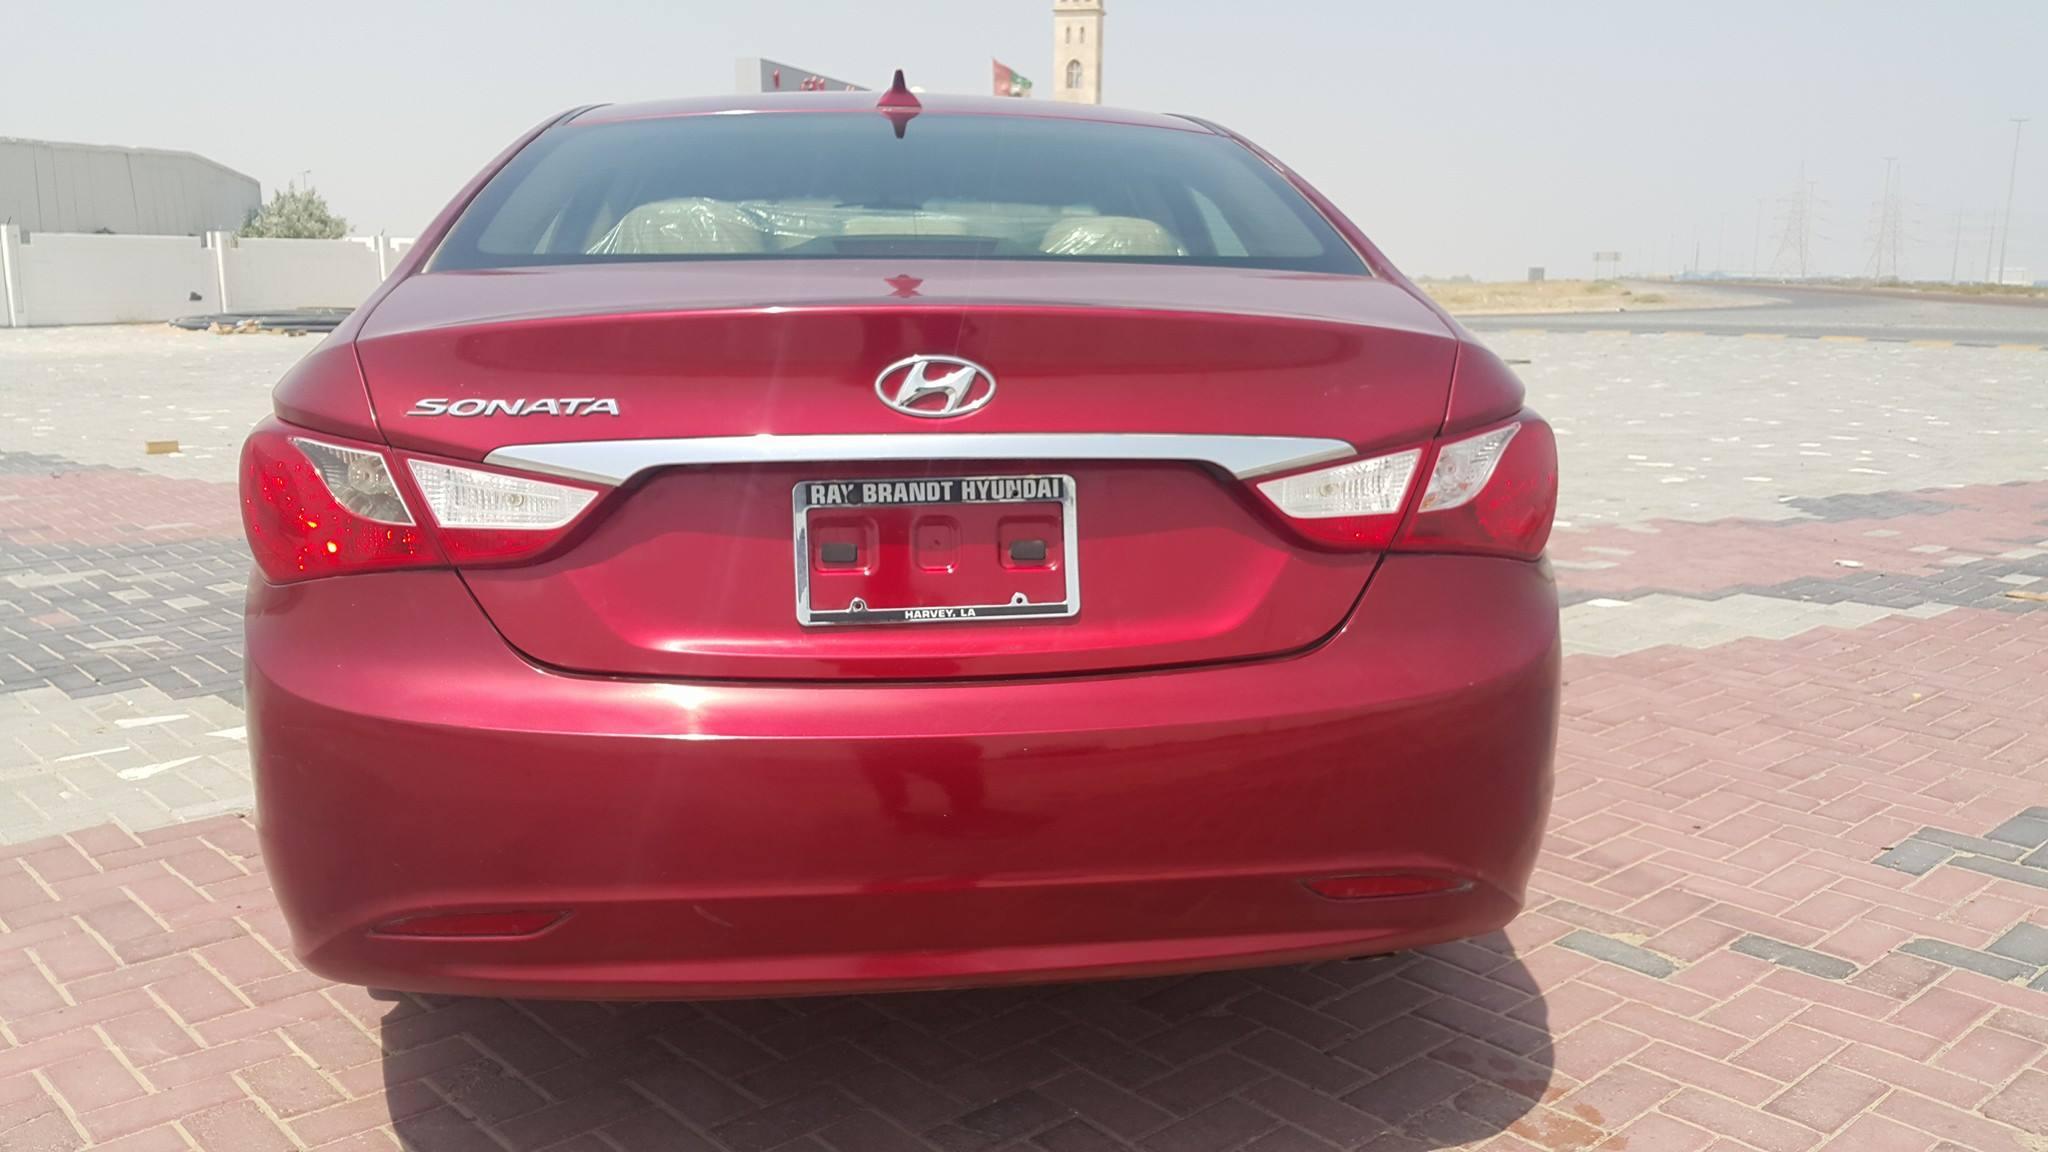 Used hyundai sonata 2013 car for sale in ajman 733224 for Hyundai motor finance fax number